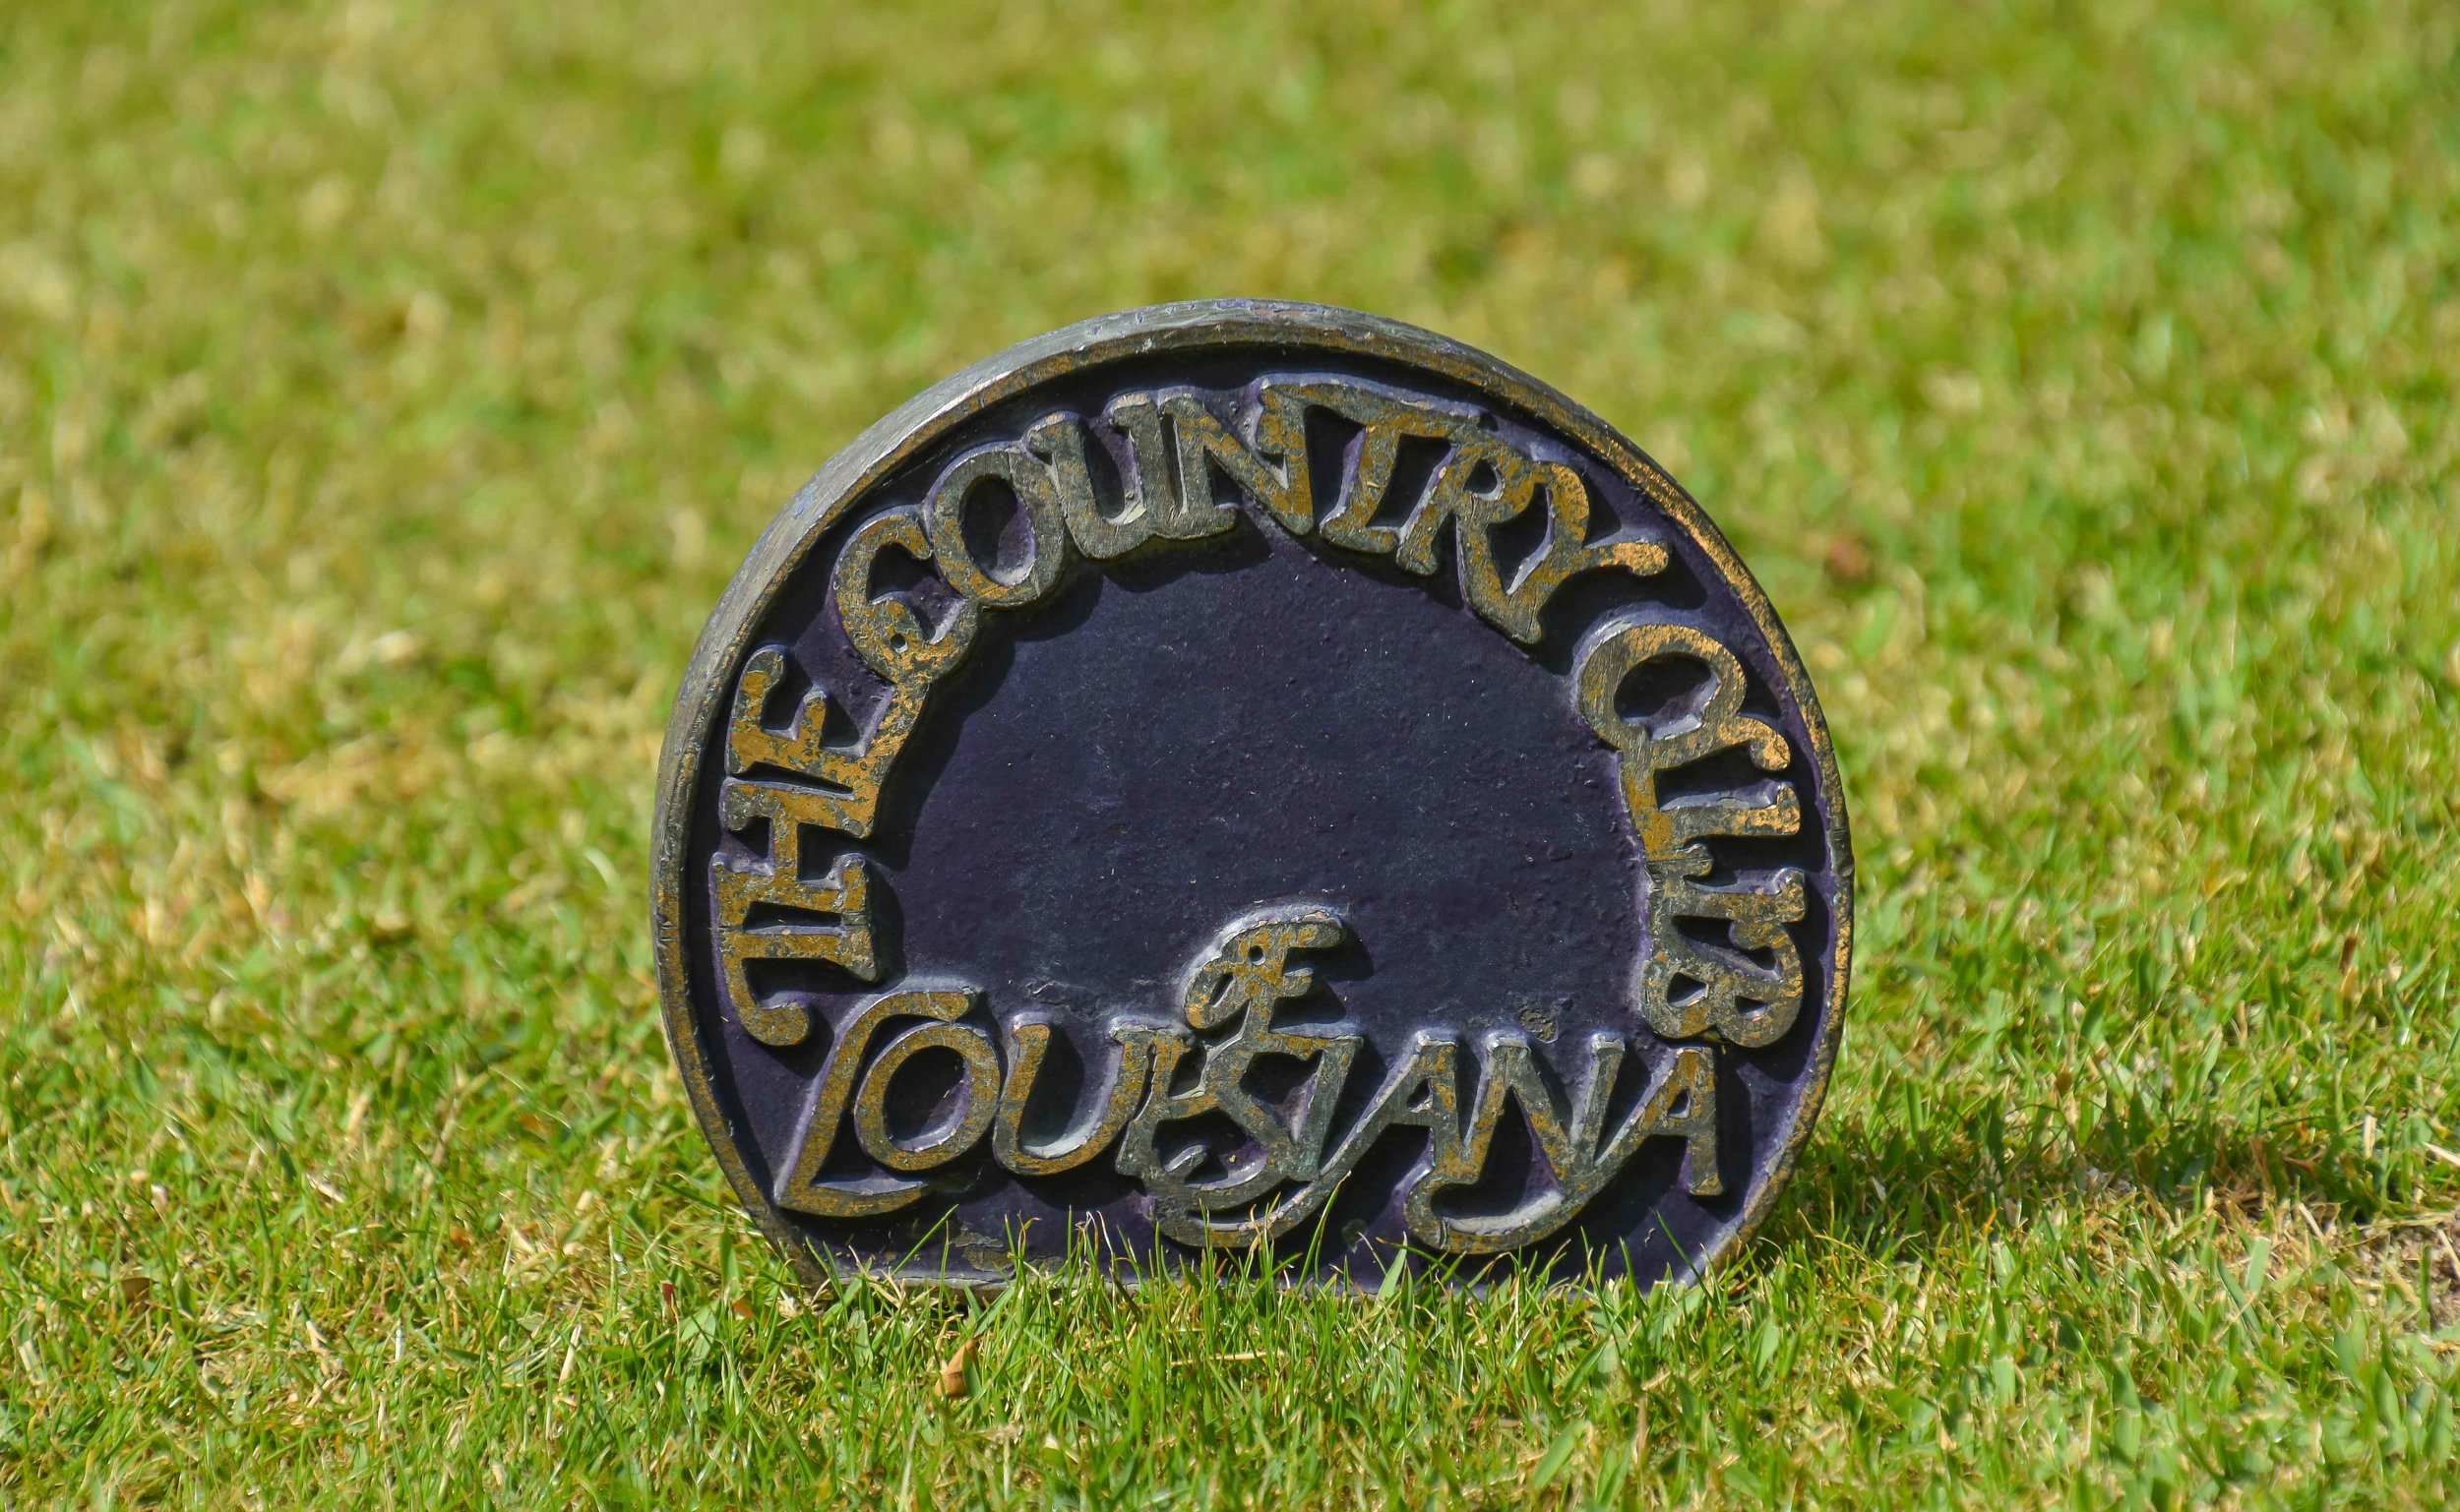 Country Club of Louisiana1-41.jpg